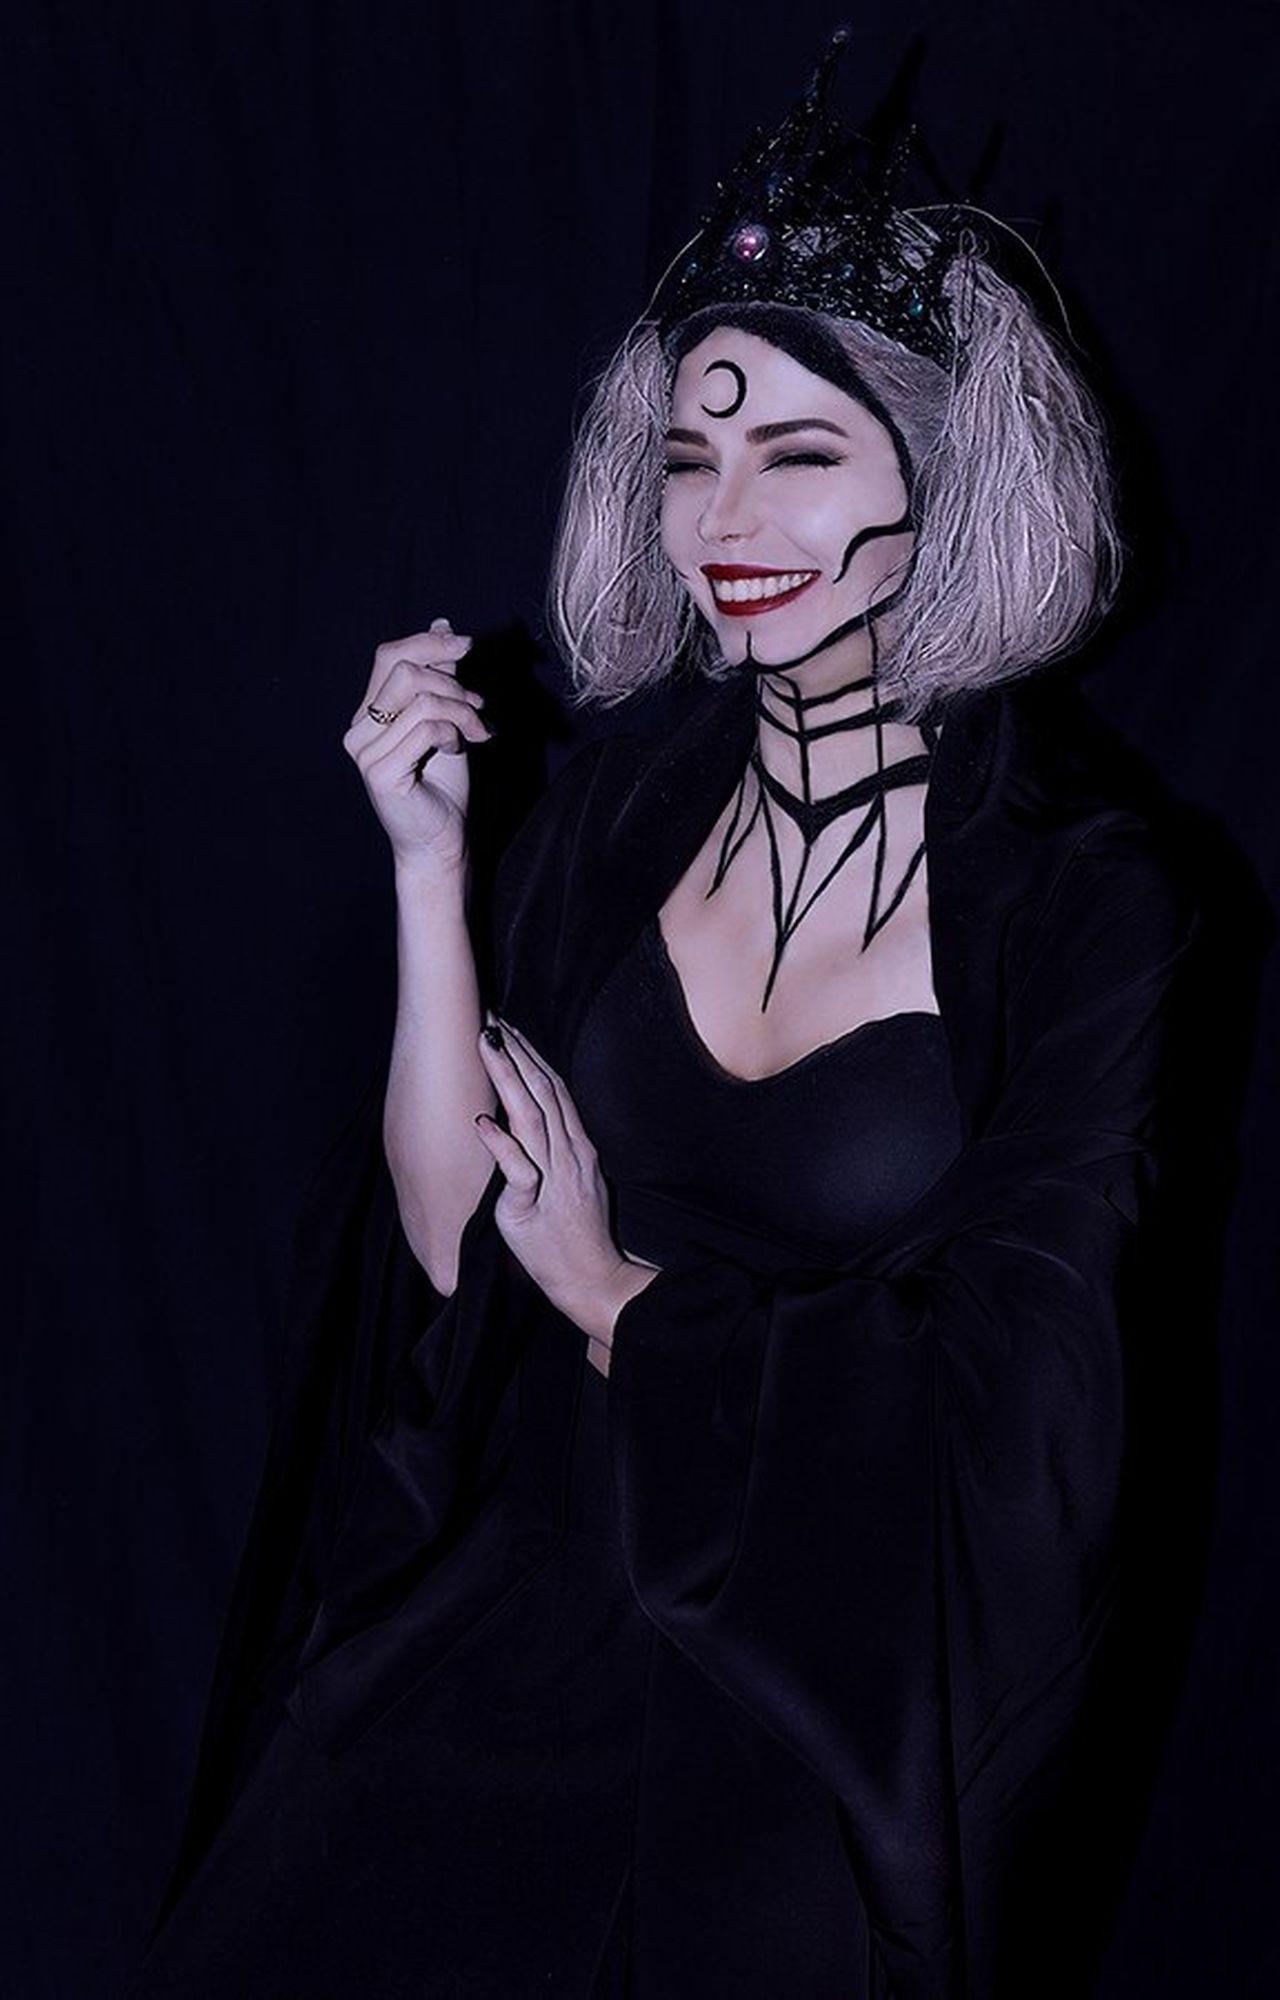 Art Artfoto Gerl Gotic Women